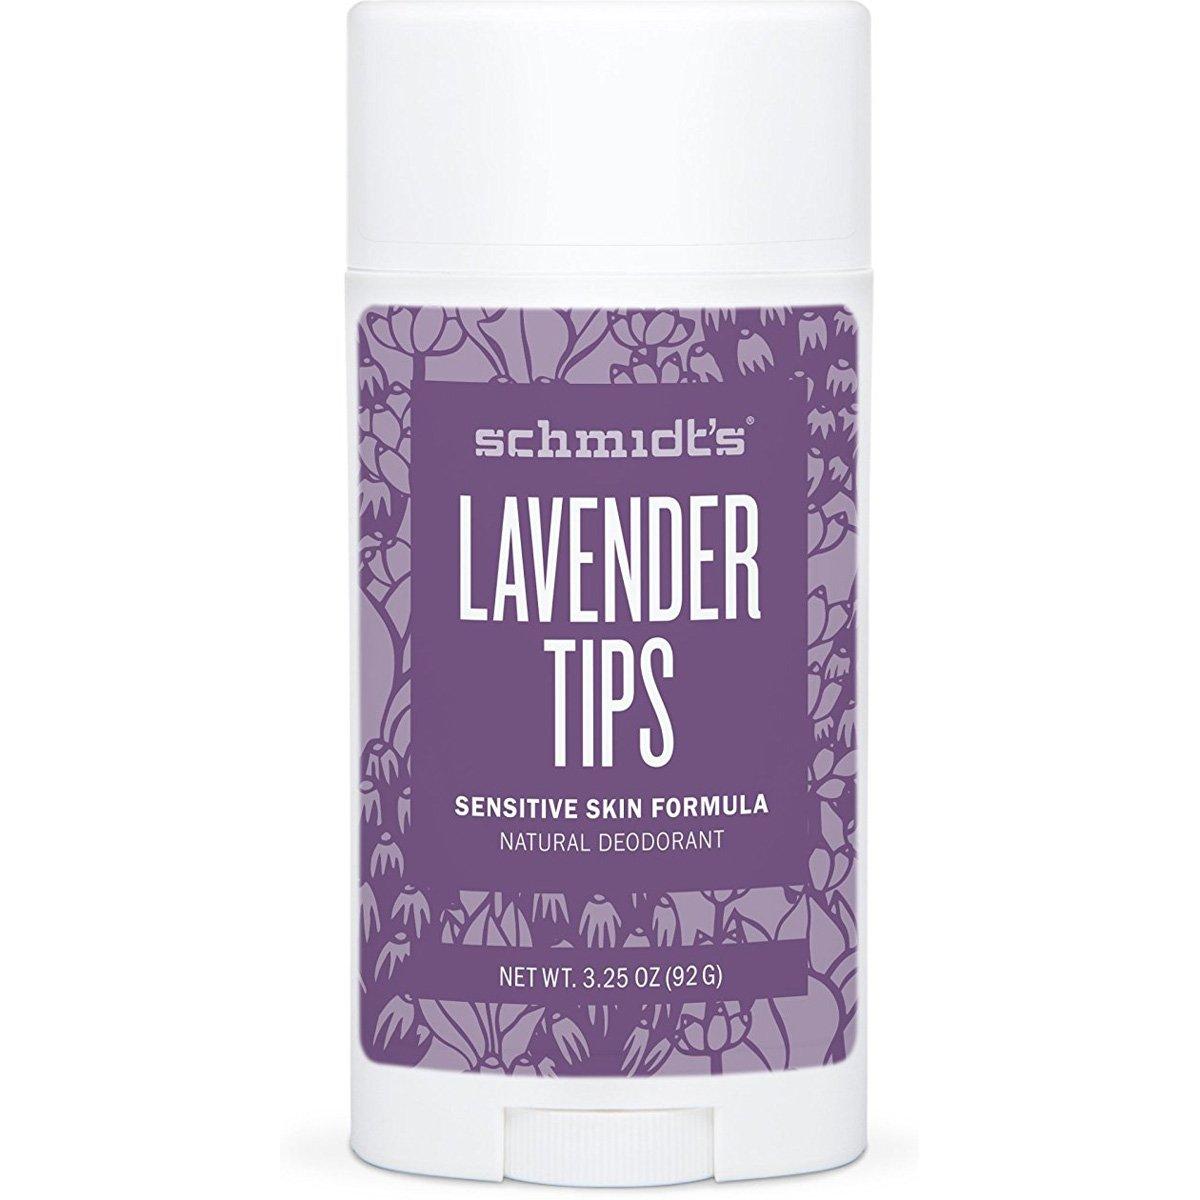 Schmidt's Natural Deodorant - Lavender Tips 3.25 Oz Sensitive Skin Stick; Aluminum-Free Odor Protection & Wetness Relief